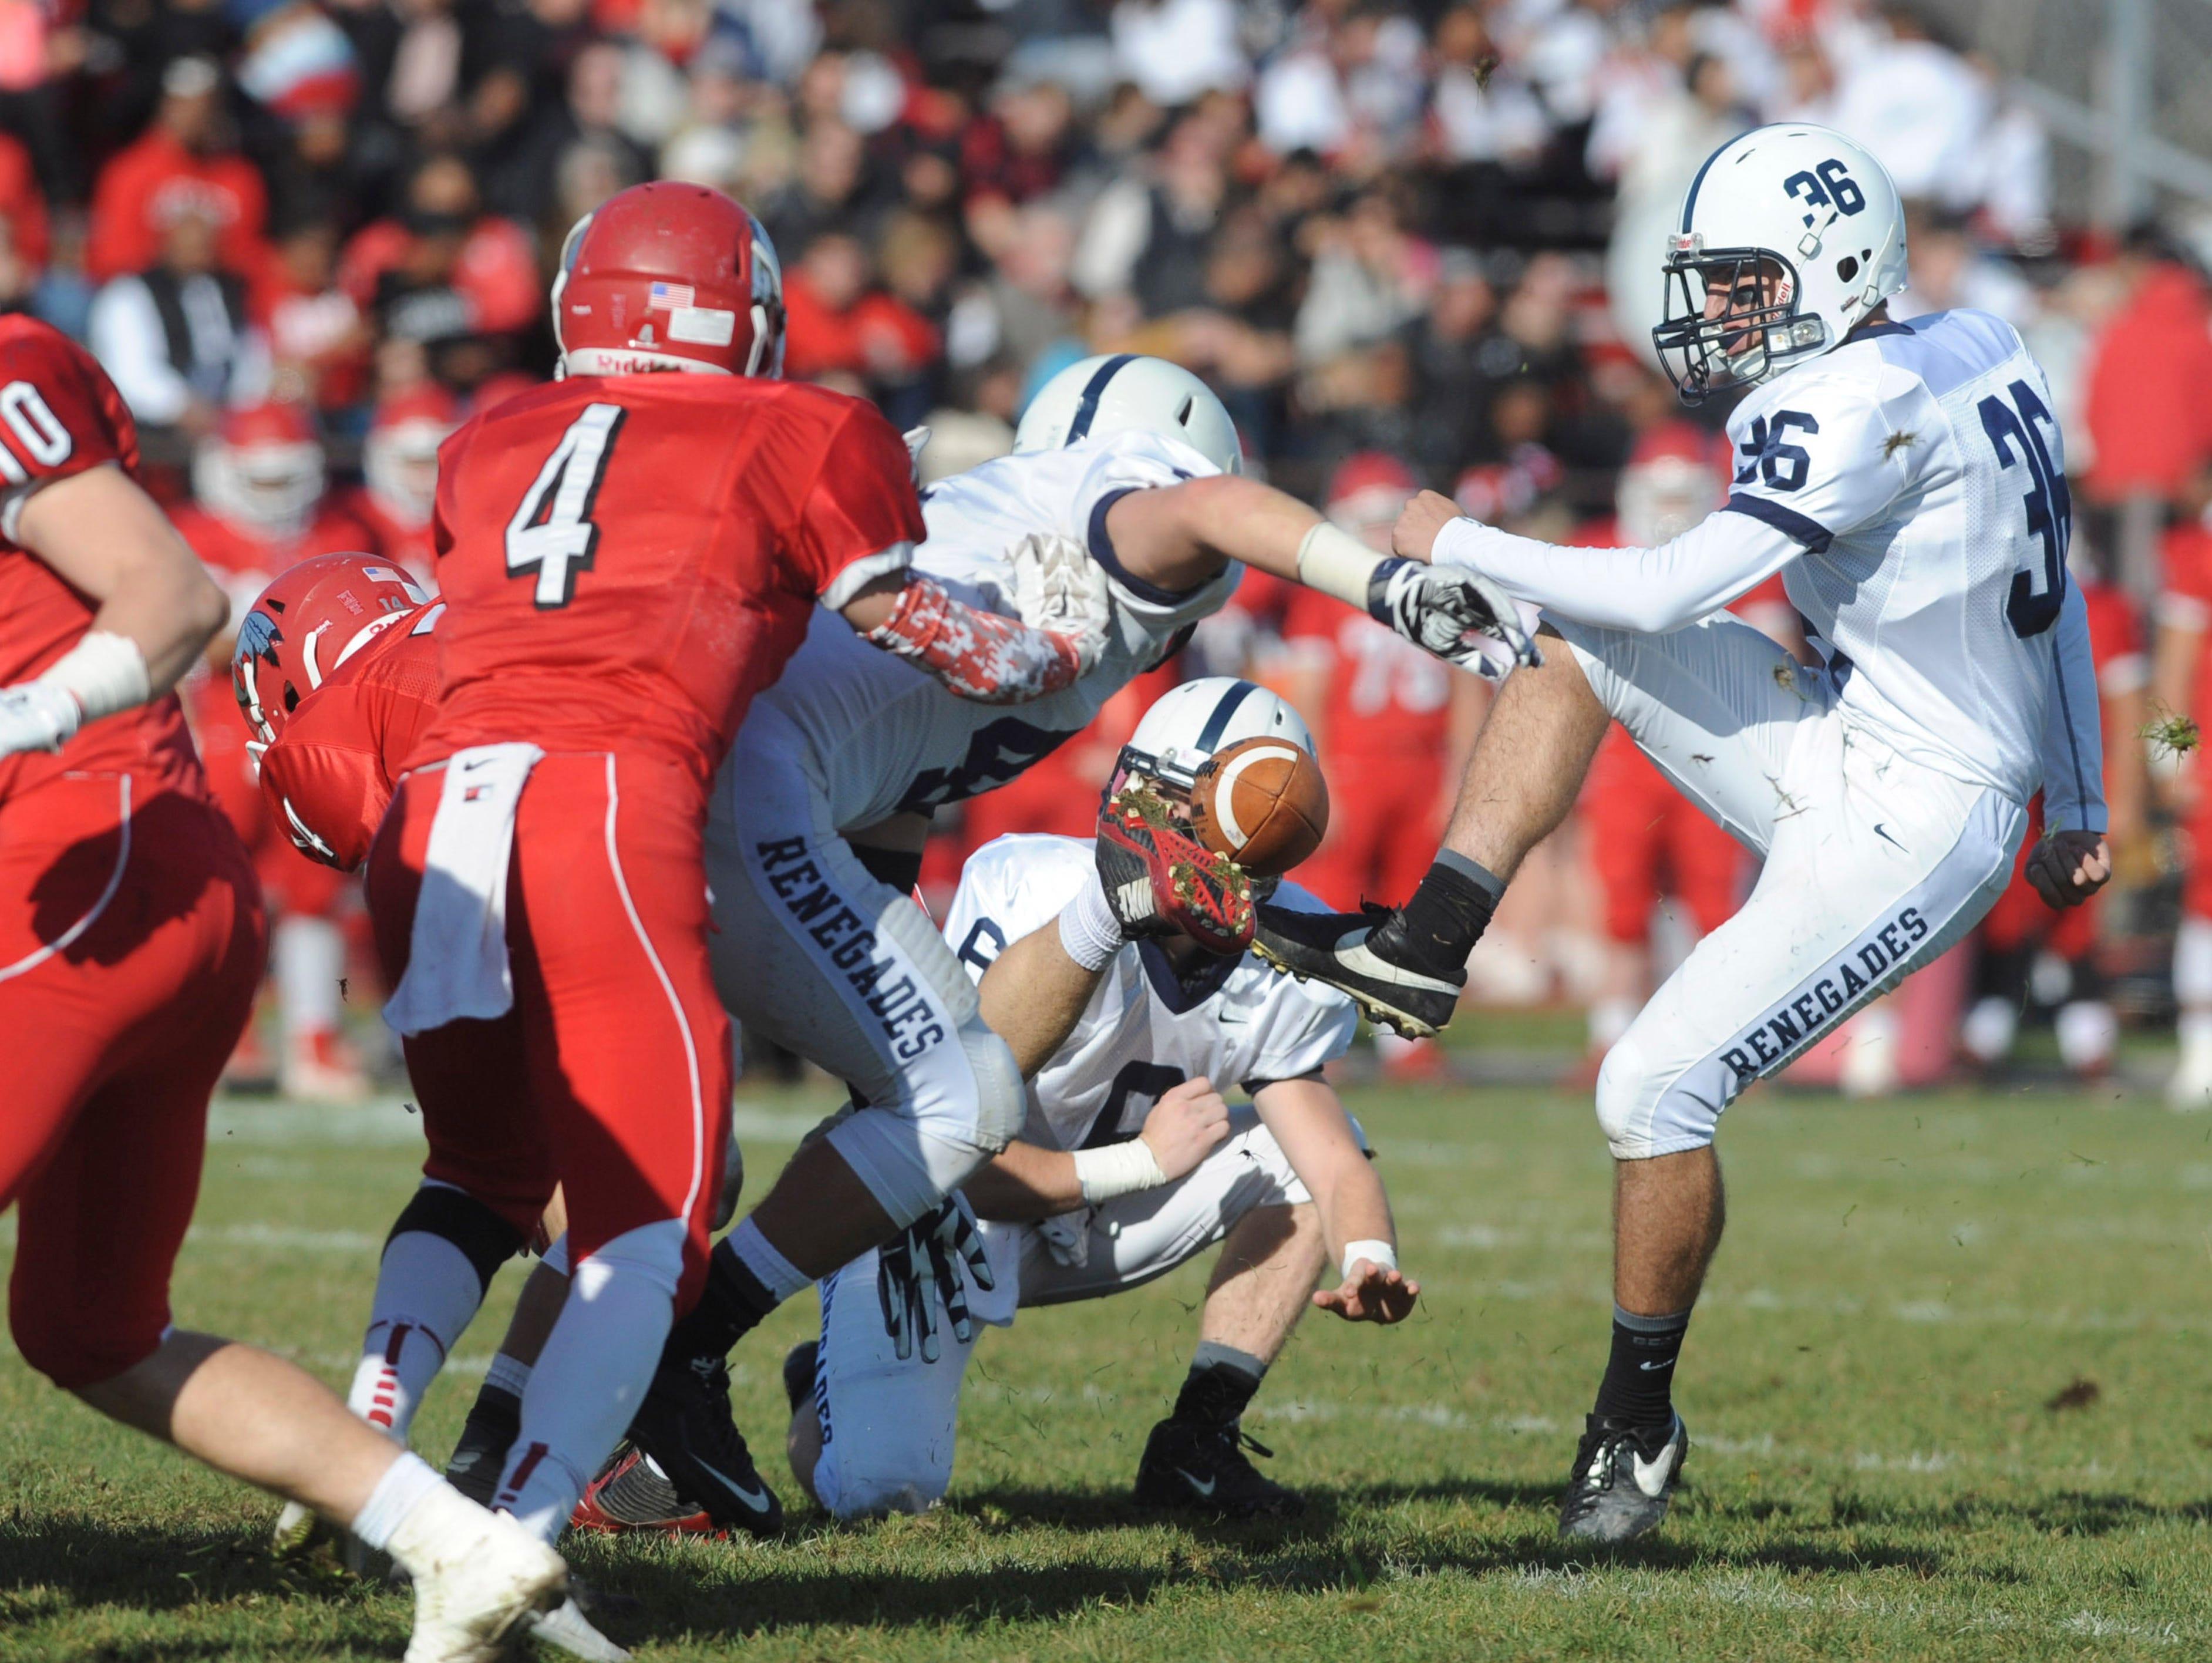 Shawnee kicker RIch Demko has the field goal blocked during Thursday's Thanksgiving Day football game against Lenape. Thursday, November 26, 2015.